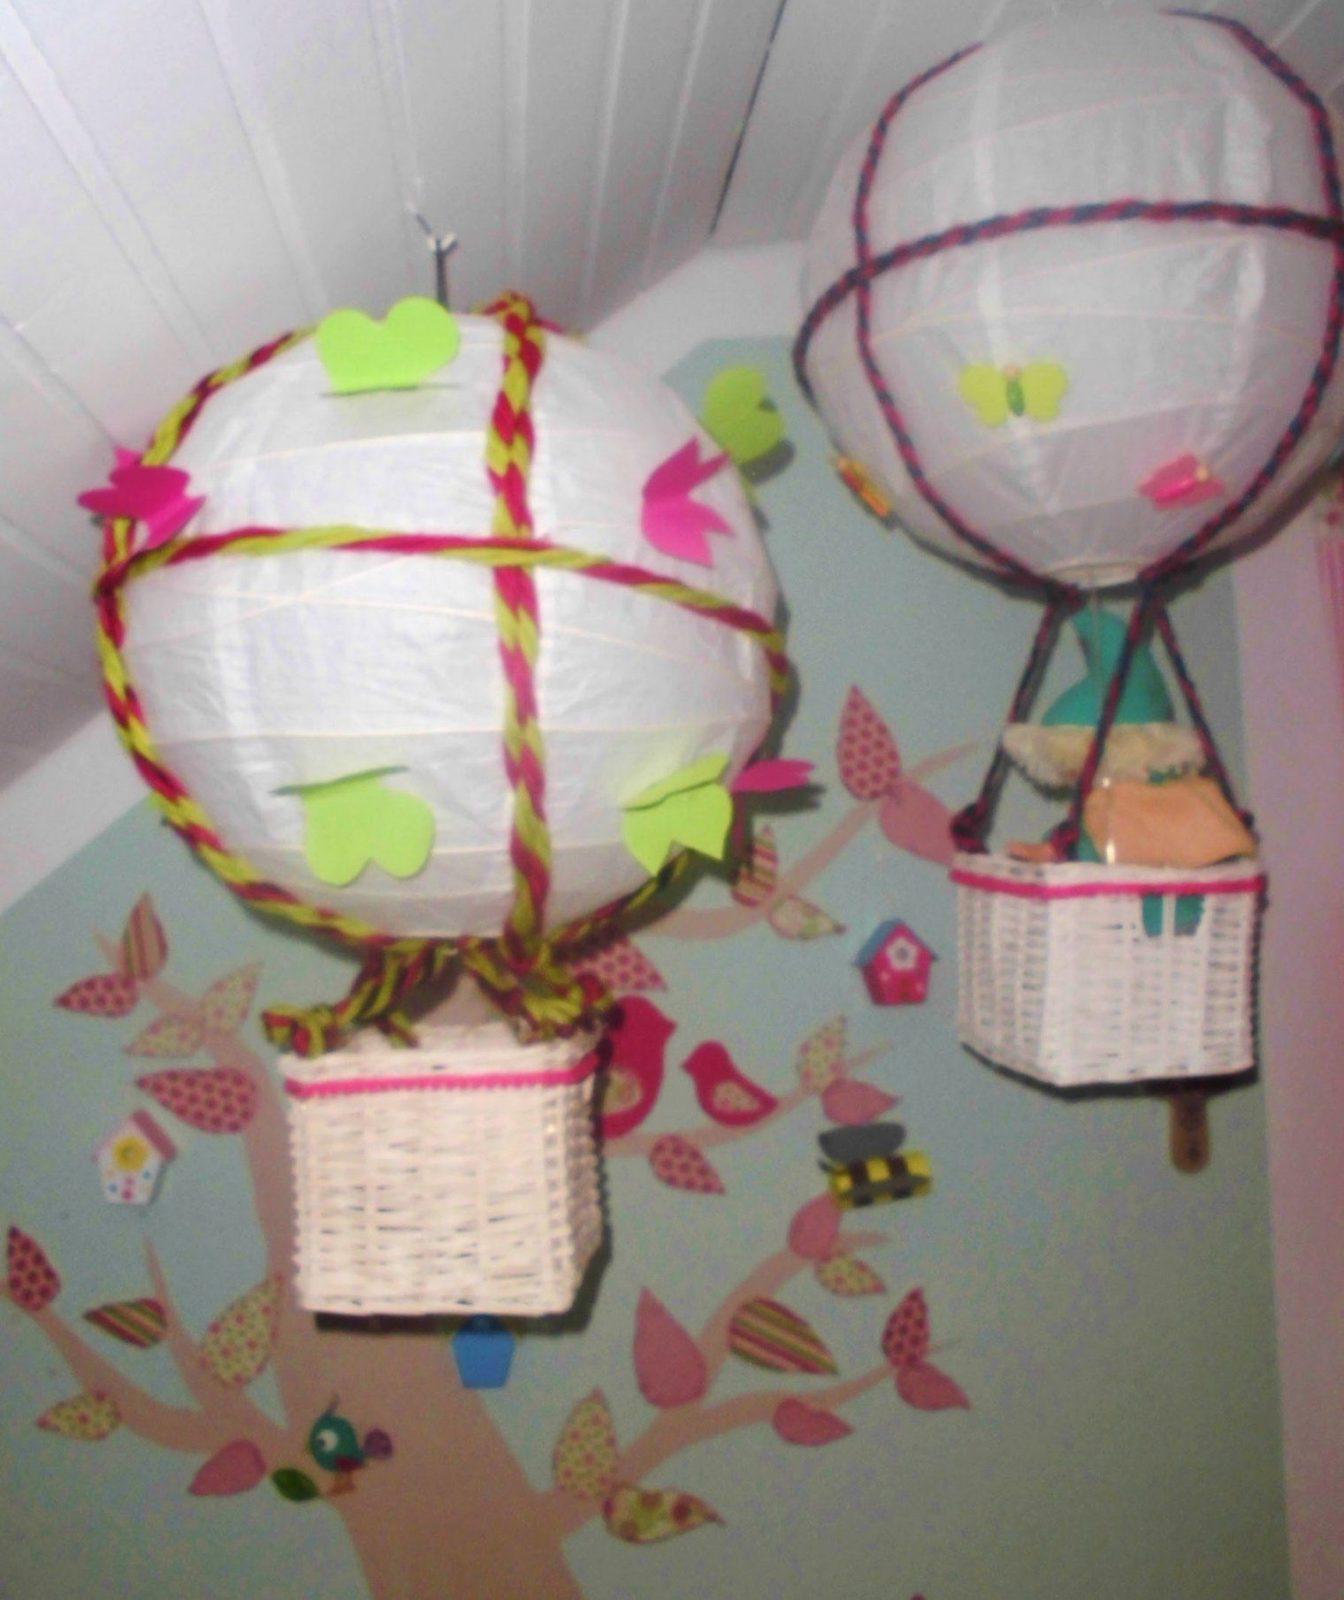 Deko Ideen Selber Machen Kinderzimmer Einzigartig Deko Fürs von Dekoideen Kinderzimmer Selber Machen Bild